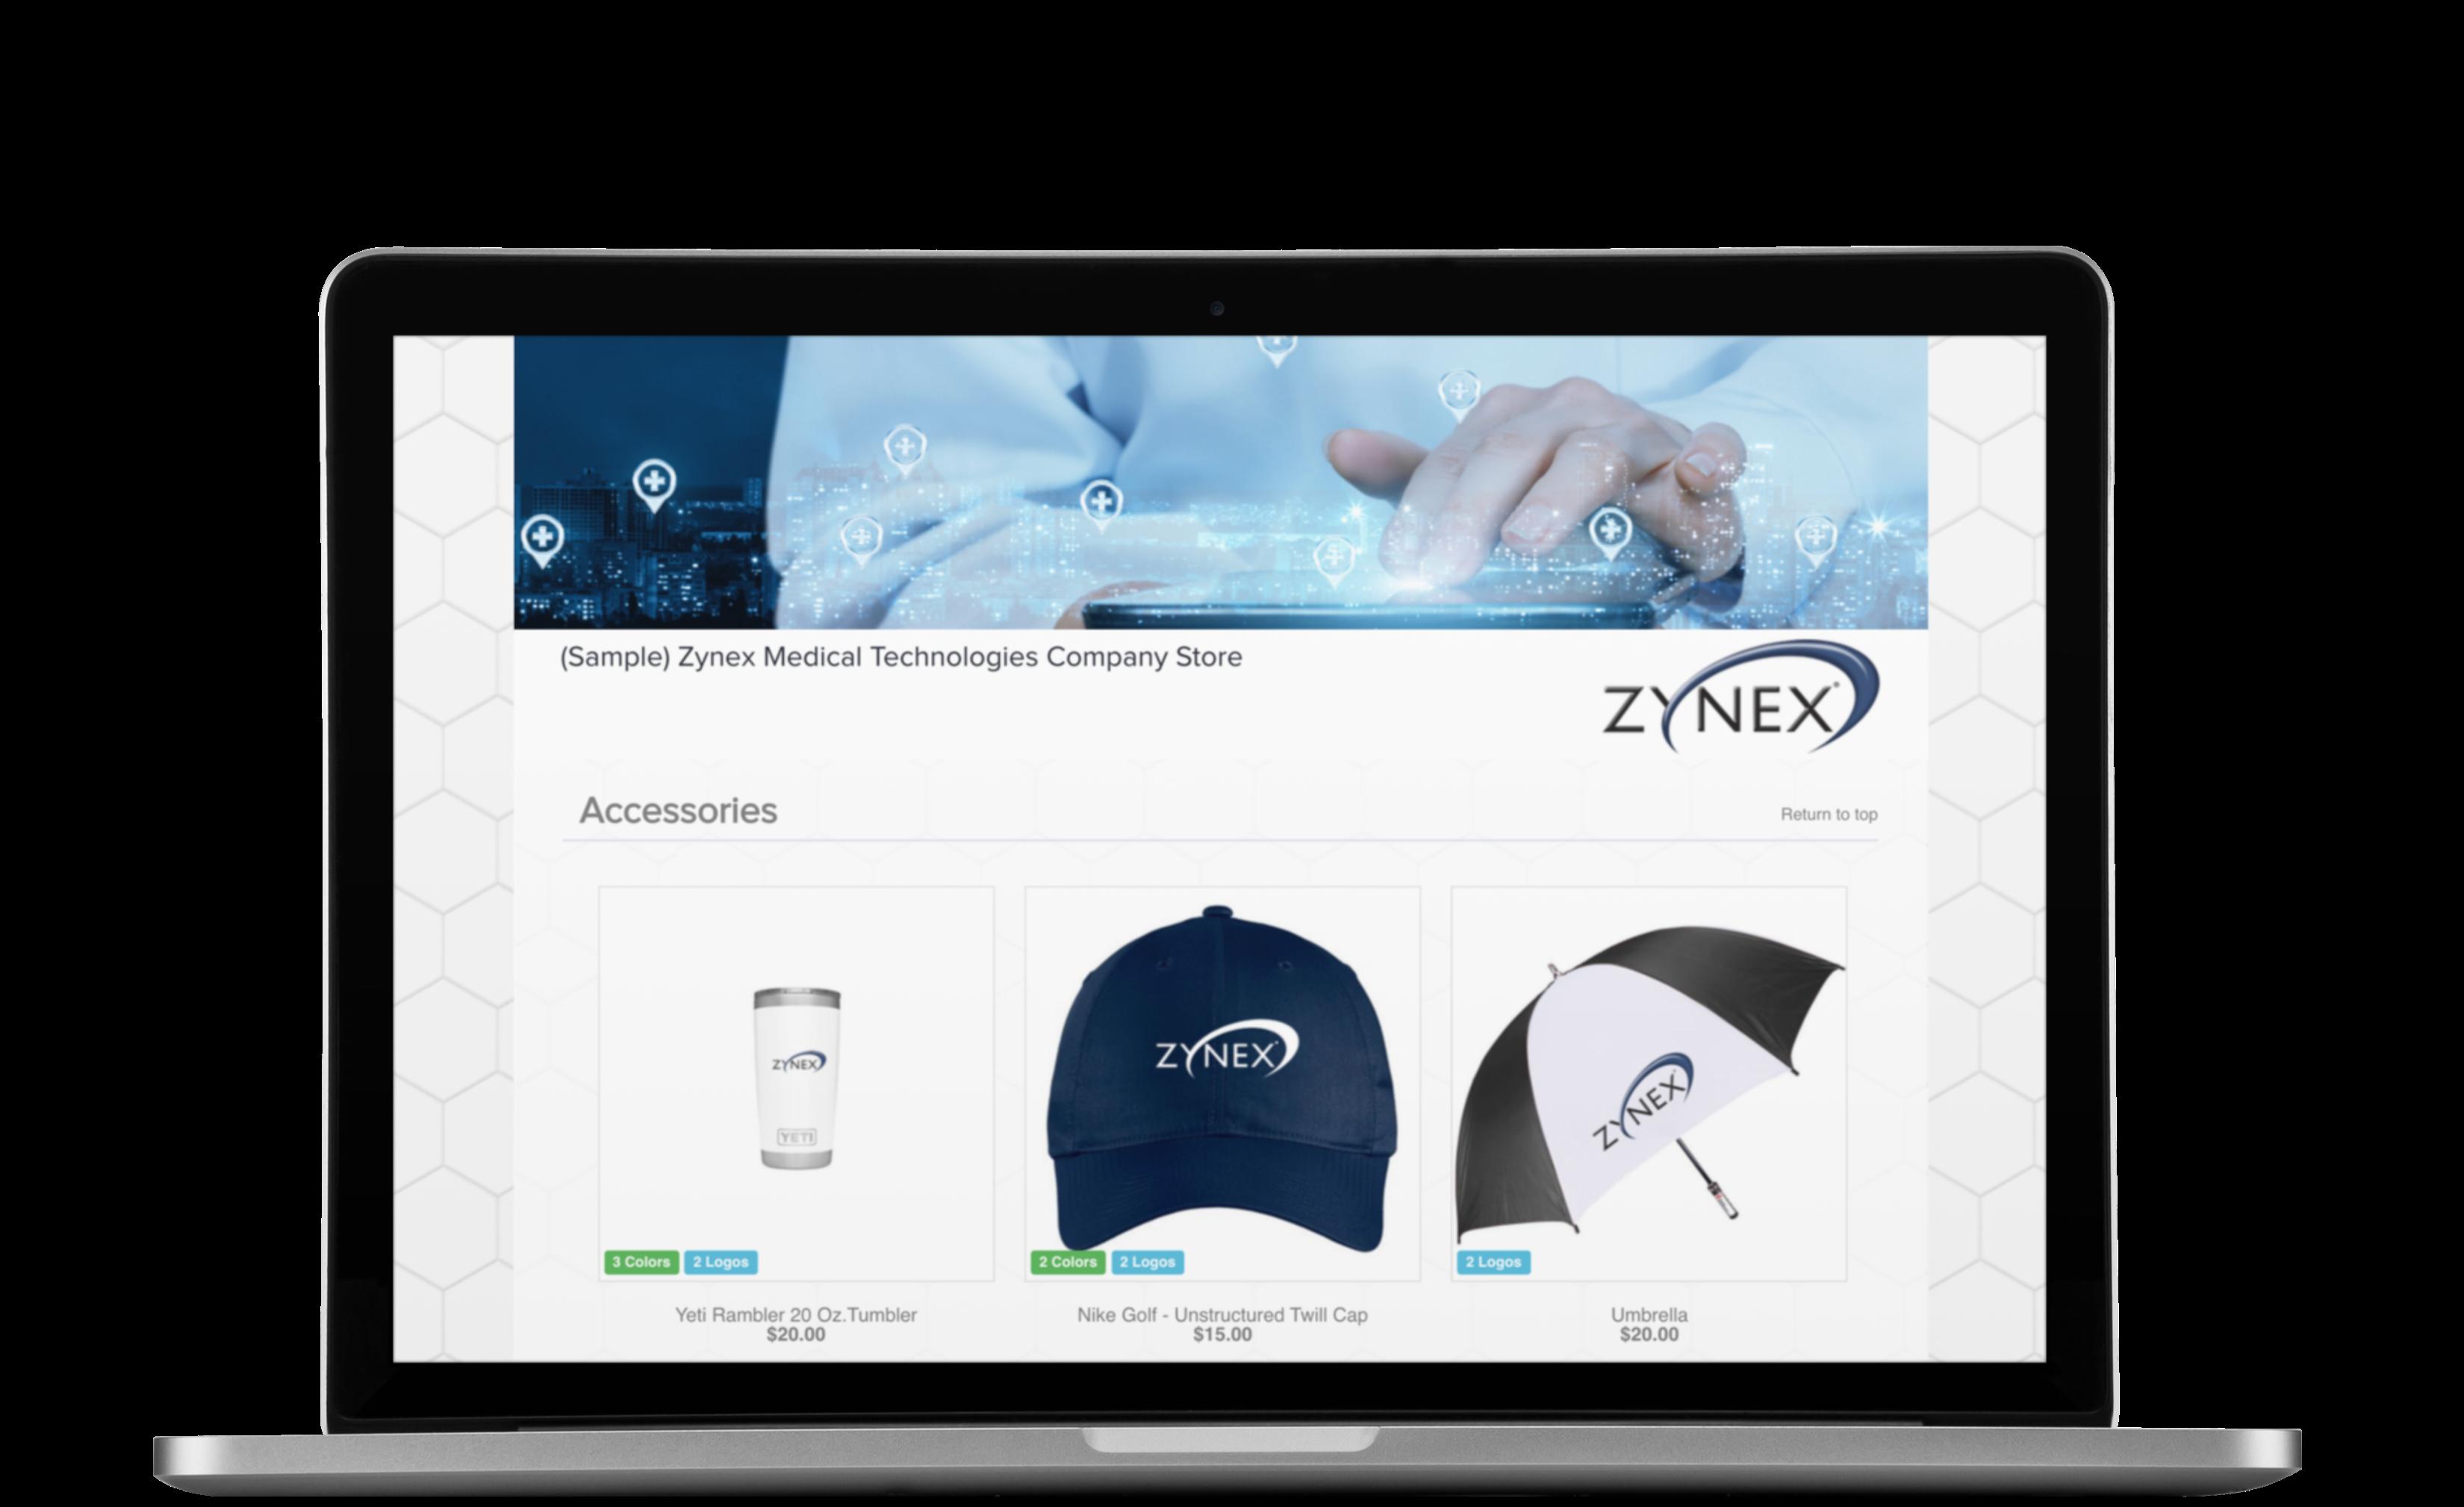 Medical Technologies Corporate Employee Online Store OrderMyGear